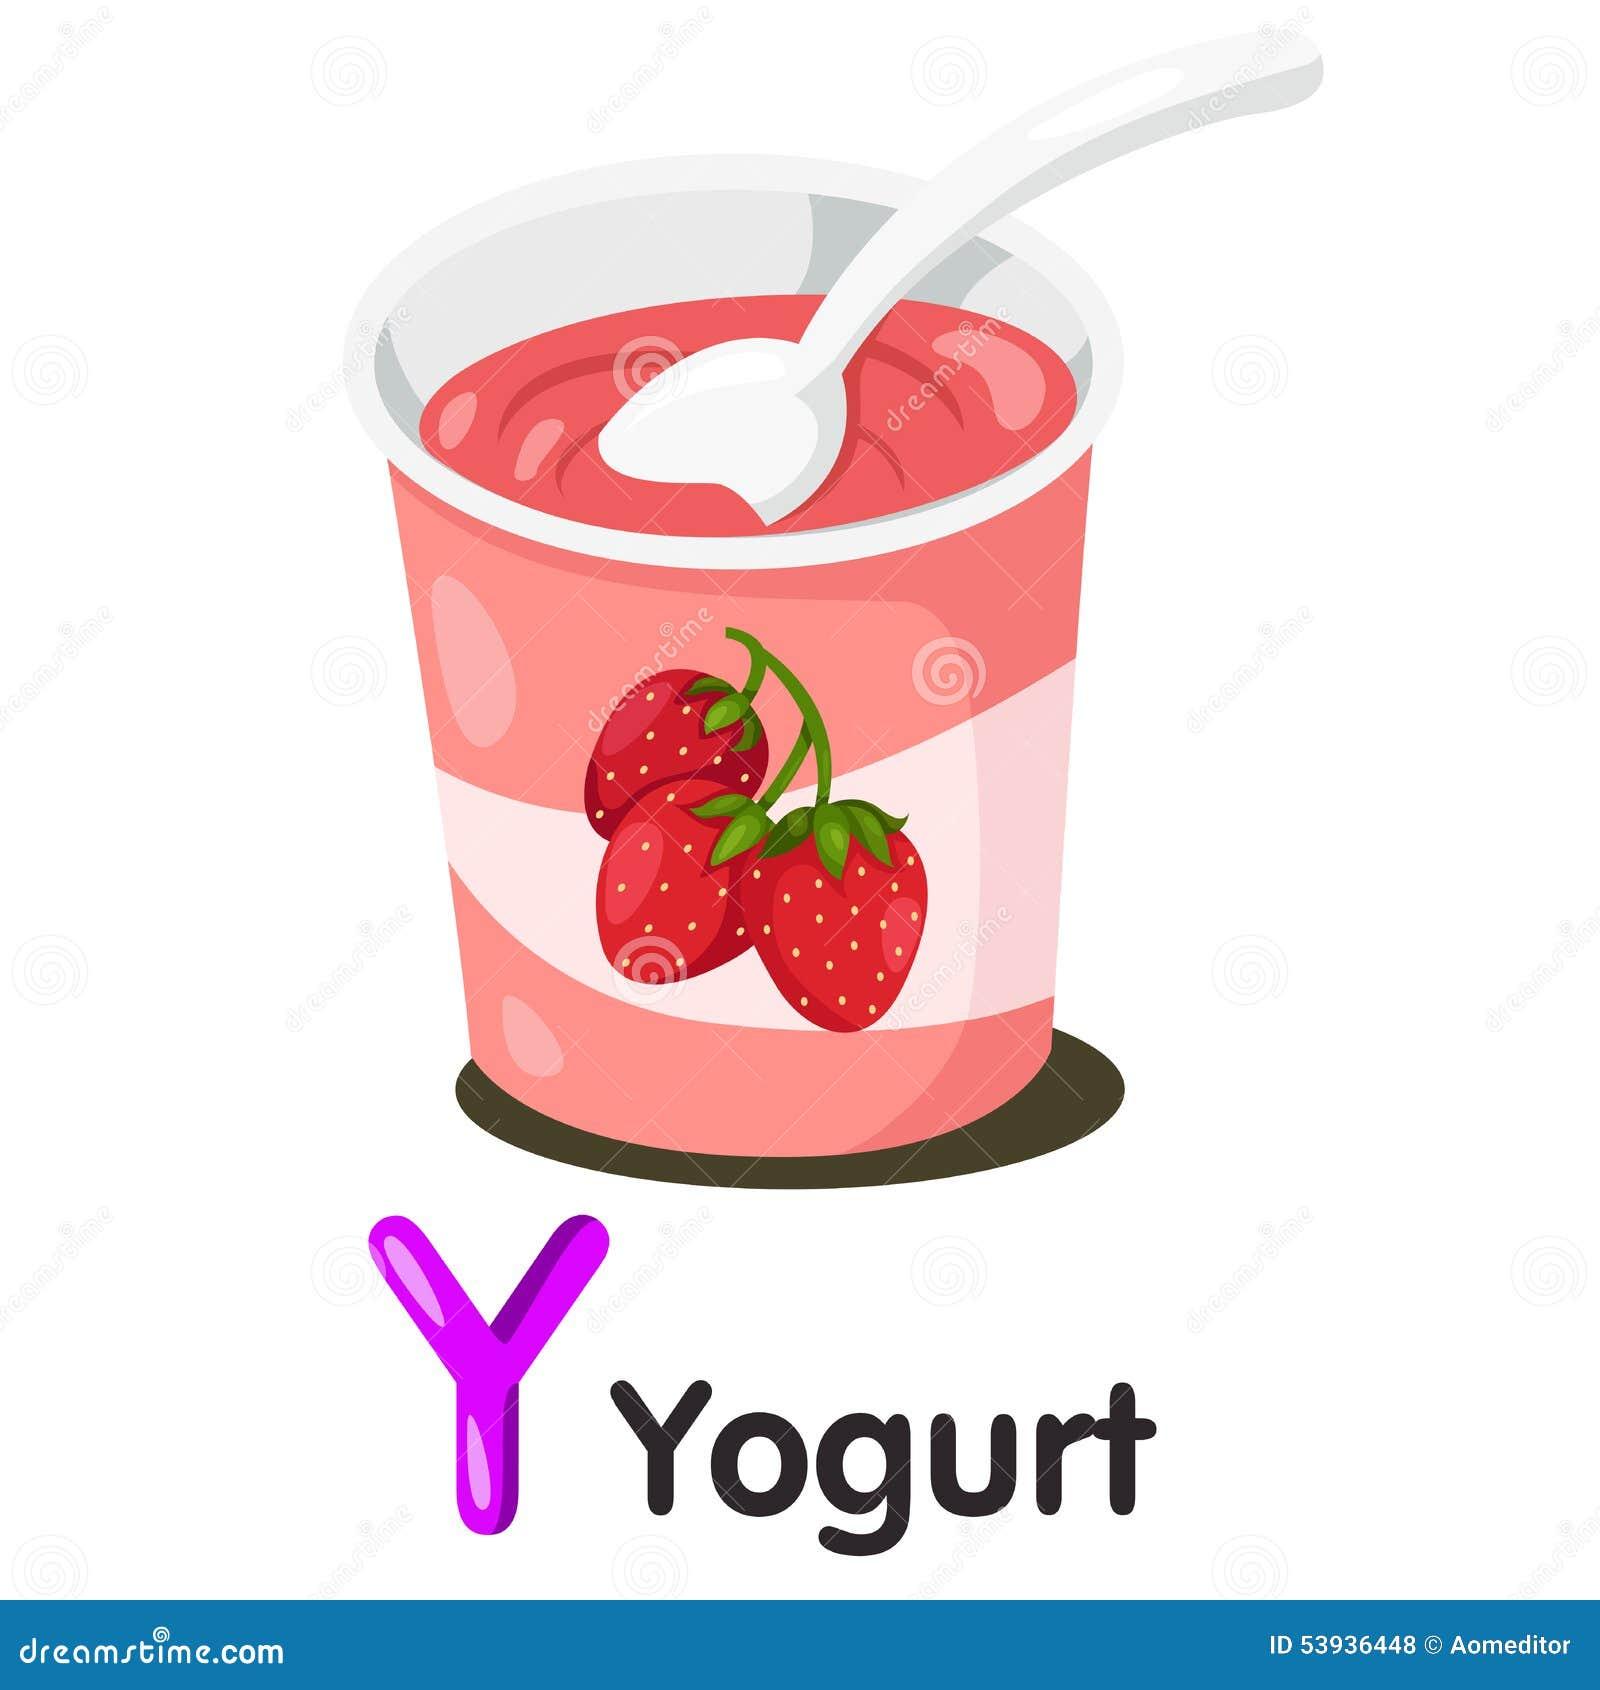 illustrator of y font with yogurt stock photo image tomato clipart black & white tomato clipart black and white